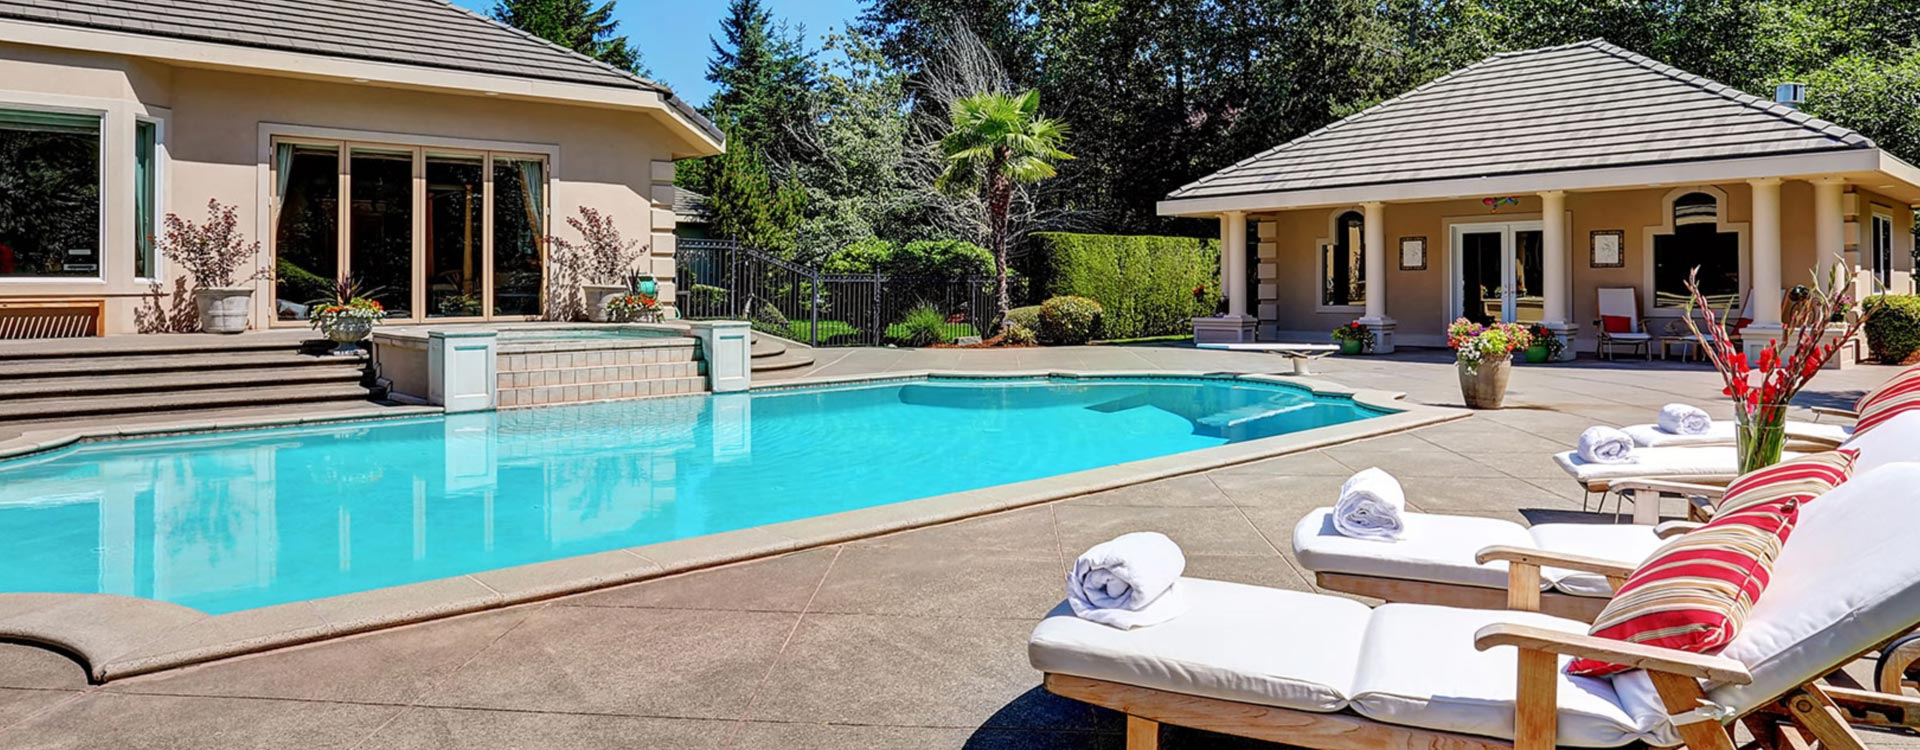 Harmony Pool Amp Spa Montgomery County Pool Service